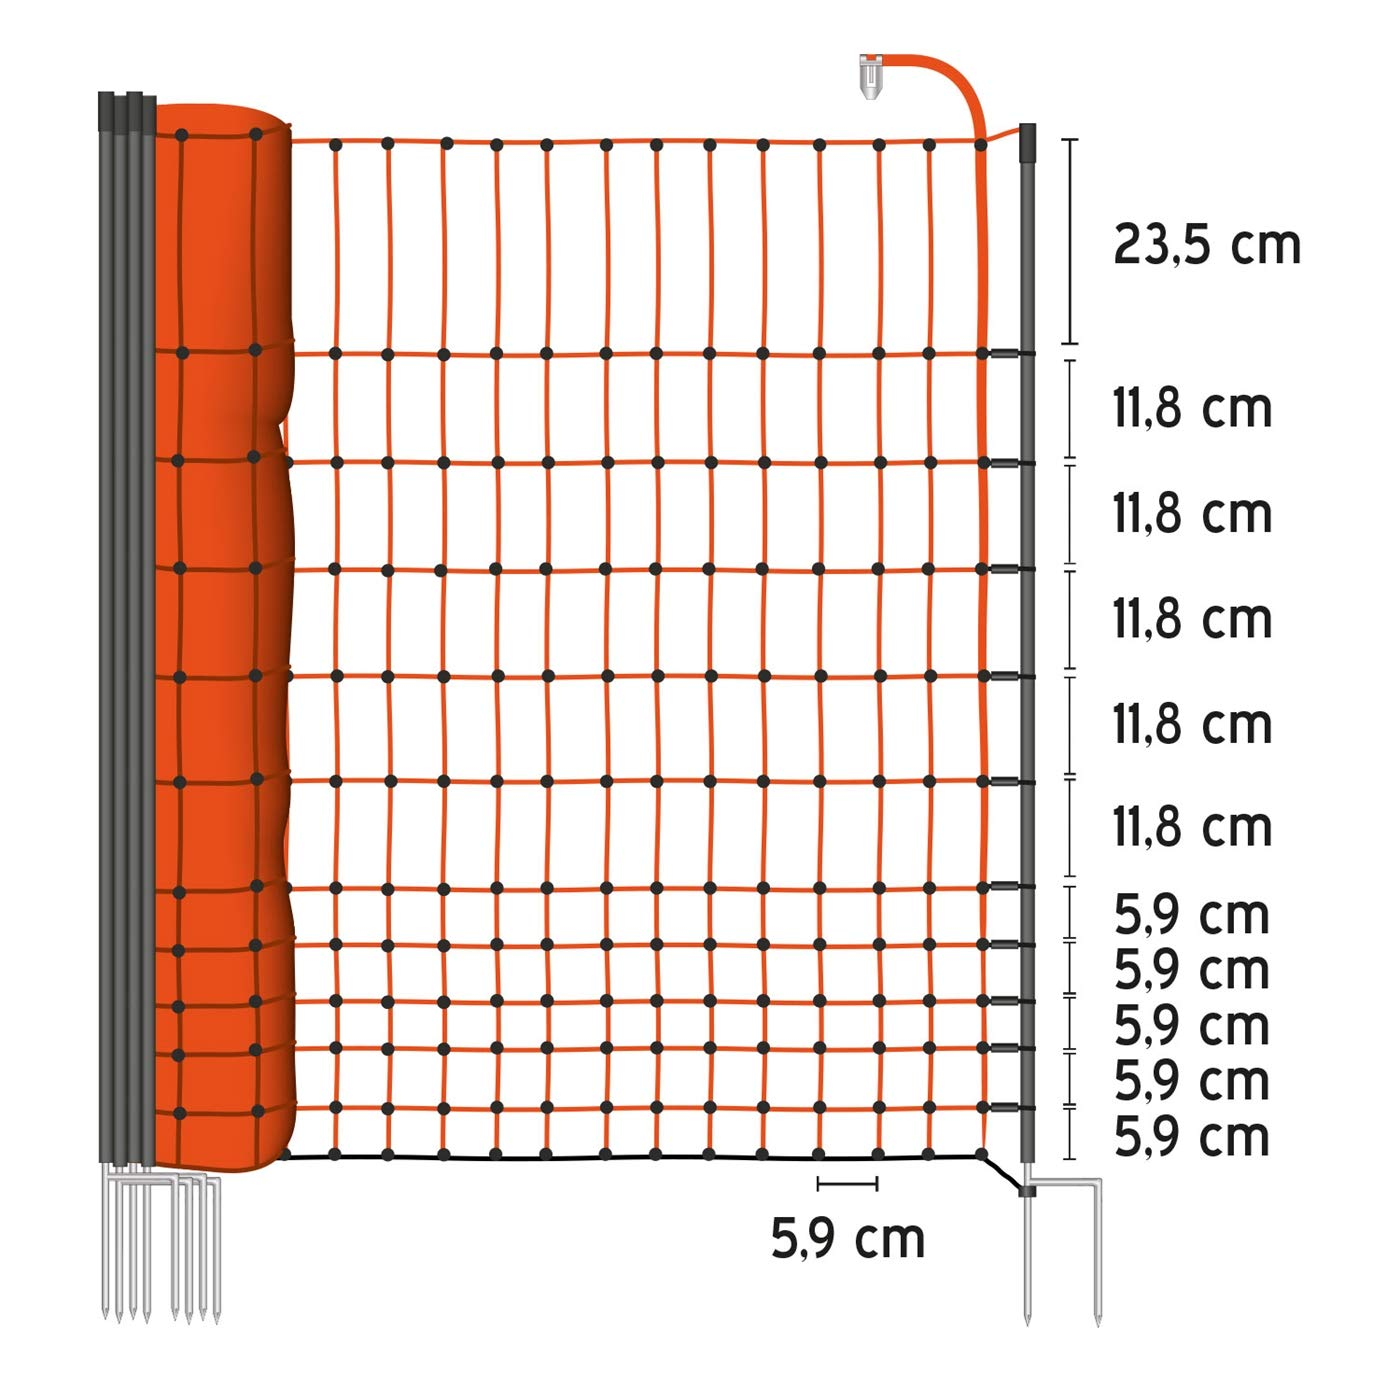 Rete pollame Voss.Farming farmNET per recinzioni elettrificabili, elettrificabili, elettrificabili, 112 cm di Altezza e 25 m di Lunghezza, a Punta Doppia, Dotata di 9 Pali, colore Arancione b8d43a